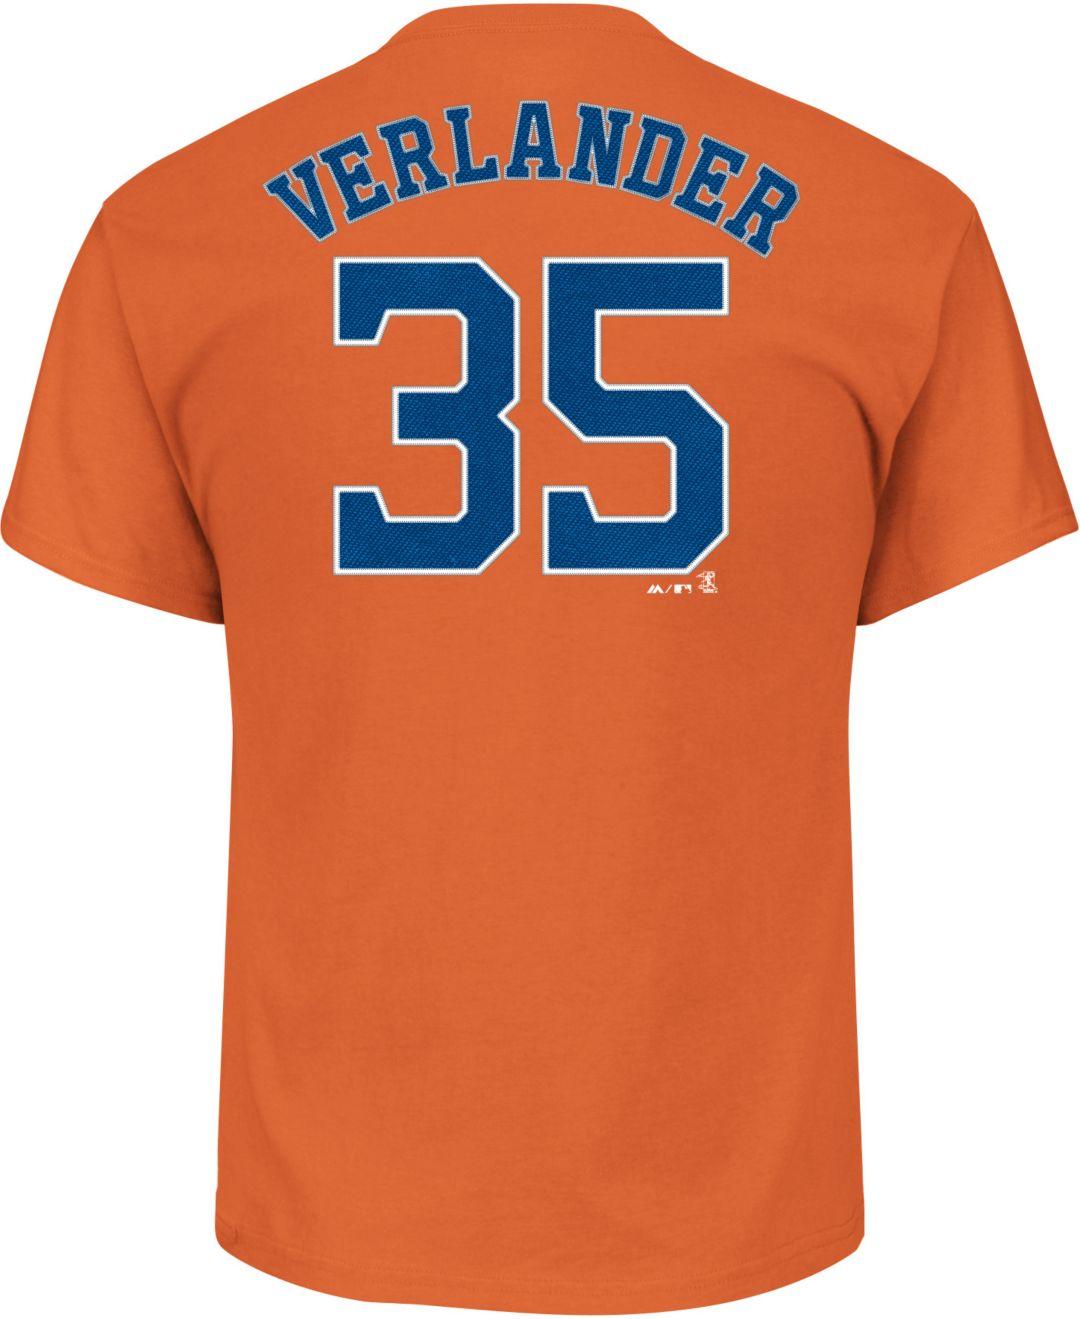 new product 8f7d4 0e771 Majestic Men's Houston Astros Justin Verlander #35 Orange T-Shirt